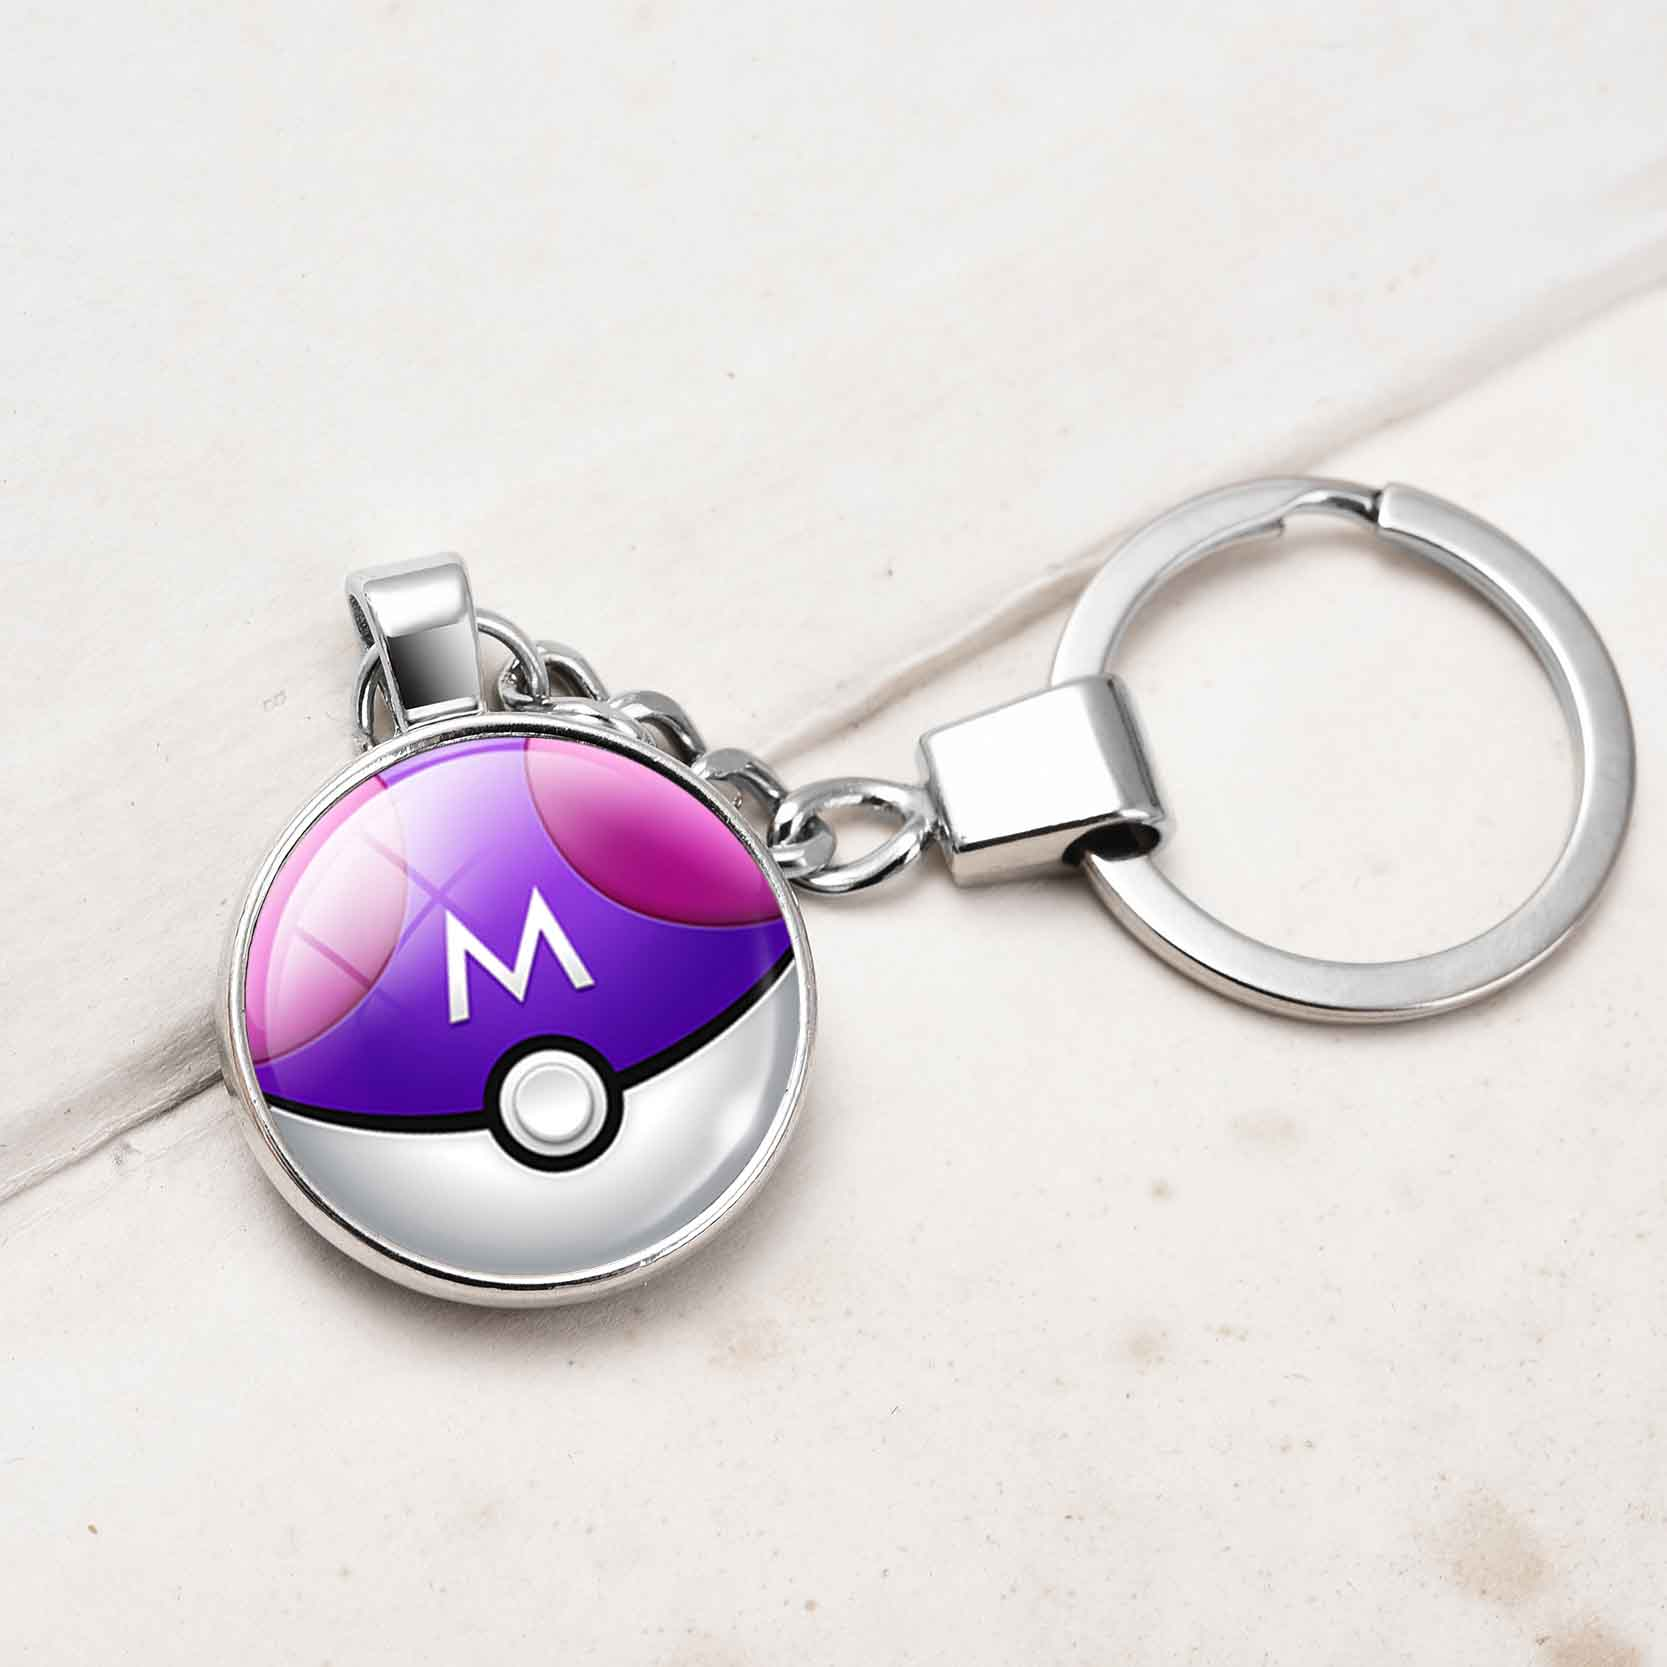 high-quality-silver-plated-font-b-pokemon-b-font-jewelry-double-side-glass-font-b-pokemon-b-font-pokeball-car-keychain-ring